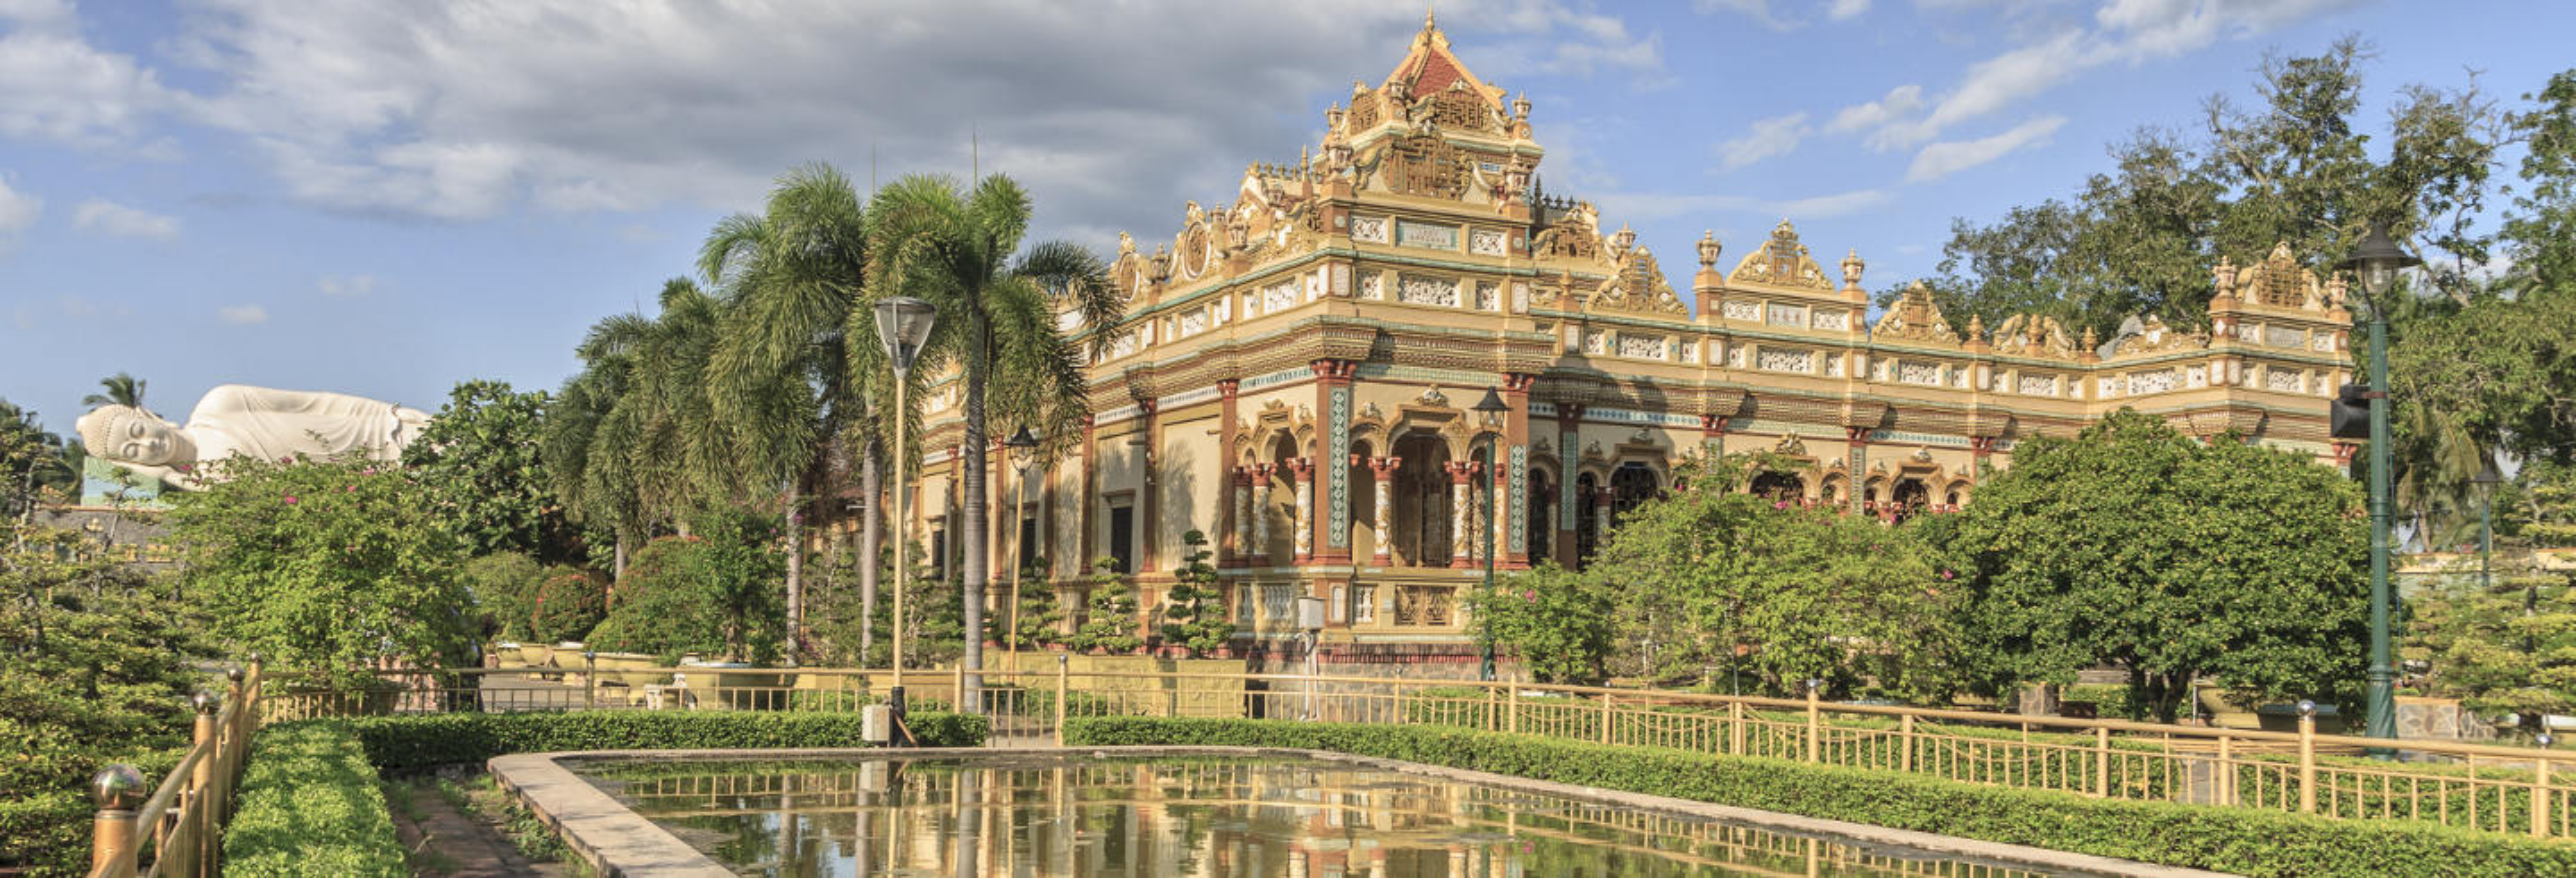 Excursion à la pagode Vinh Tràng et au delta del Mékong